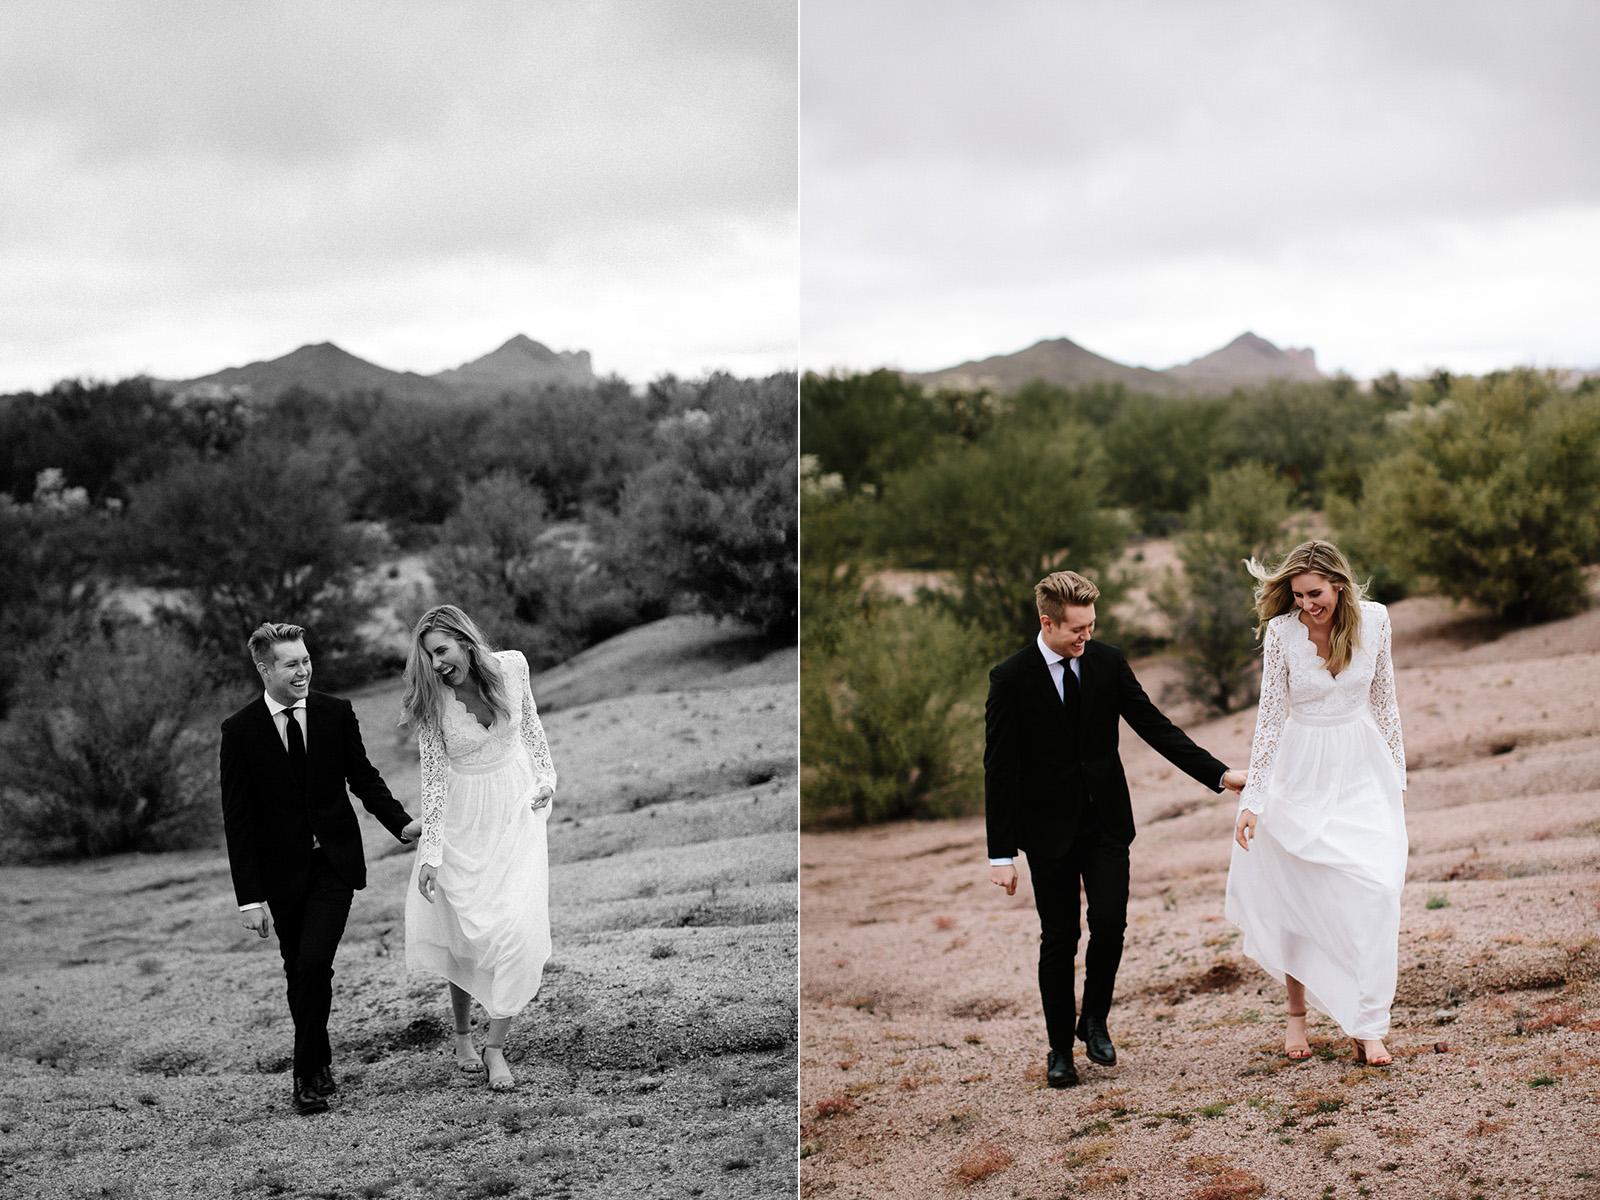 phoenix-mesa-elopement-wedding-photographer-lost-dutchman-state-park-superstitious-mountains-08.jpg